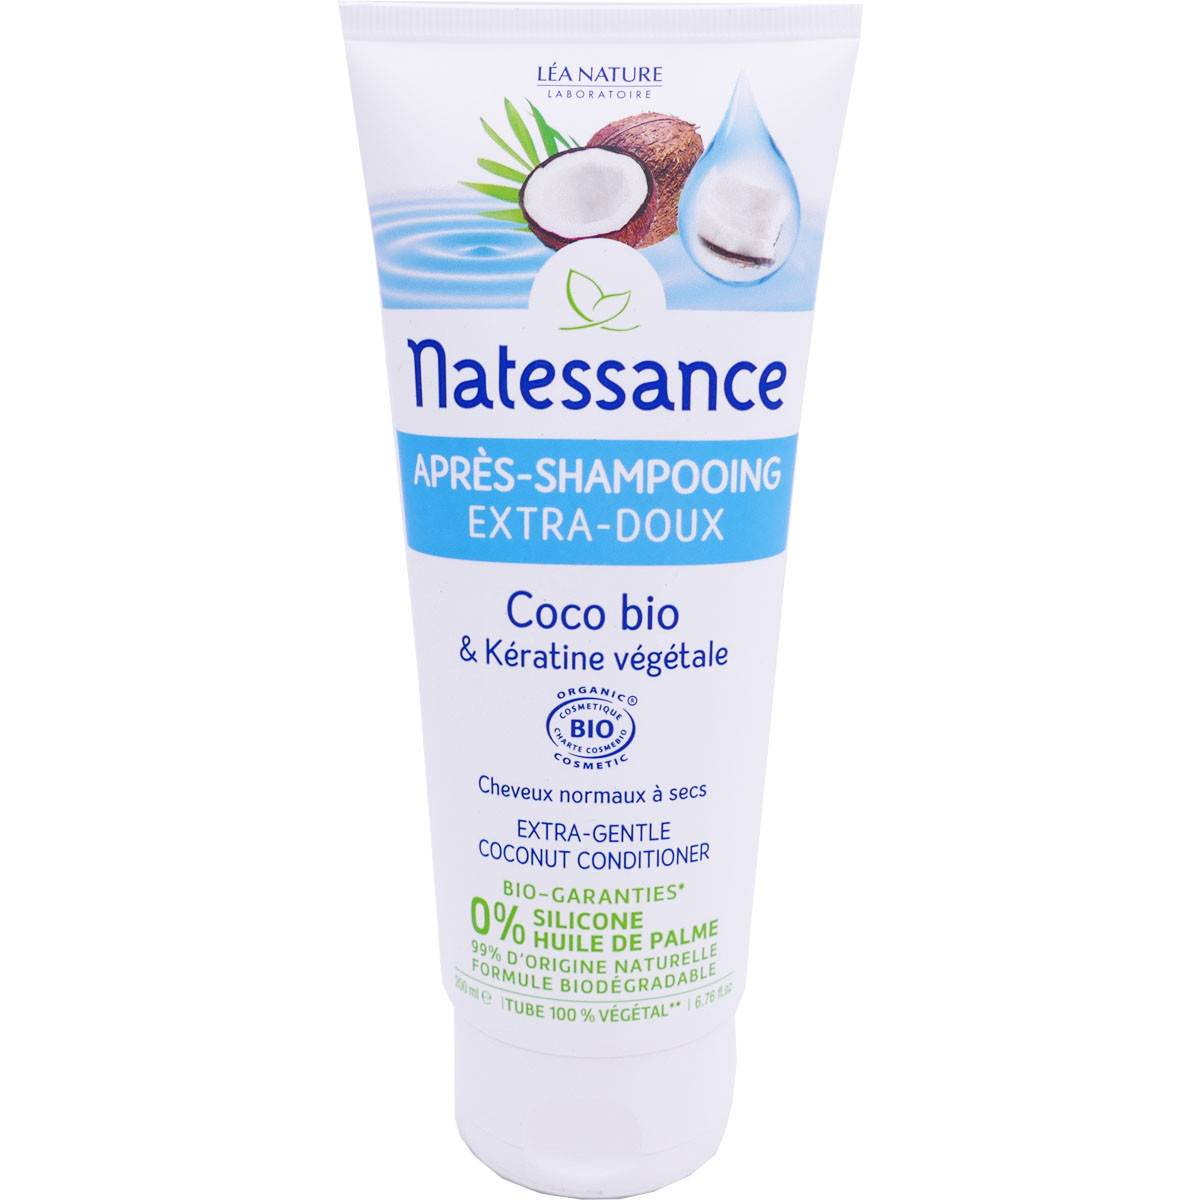 Natessance apres shampooing coco bio 200 ml